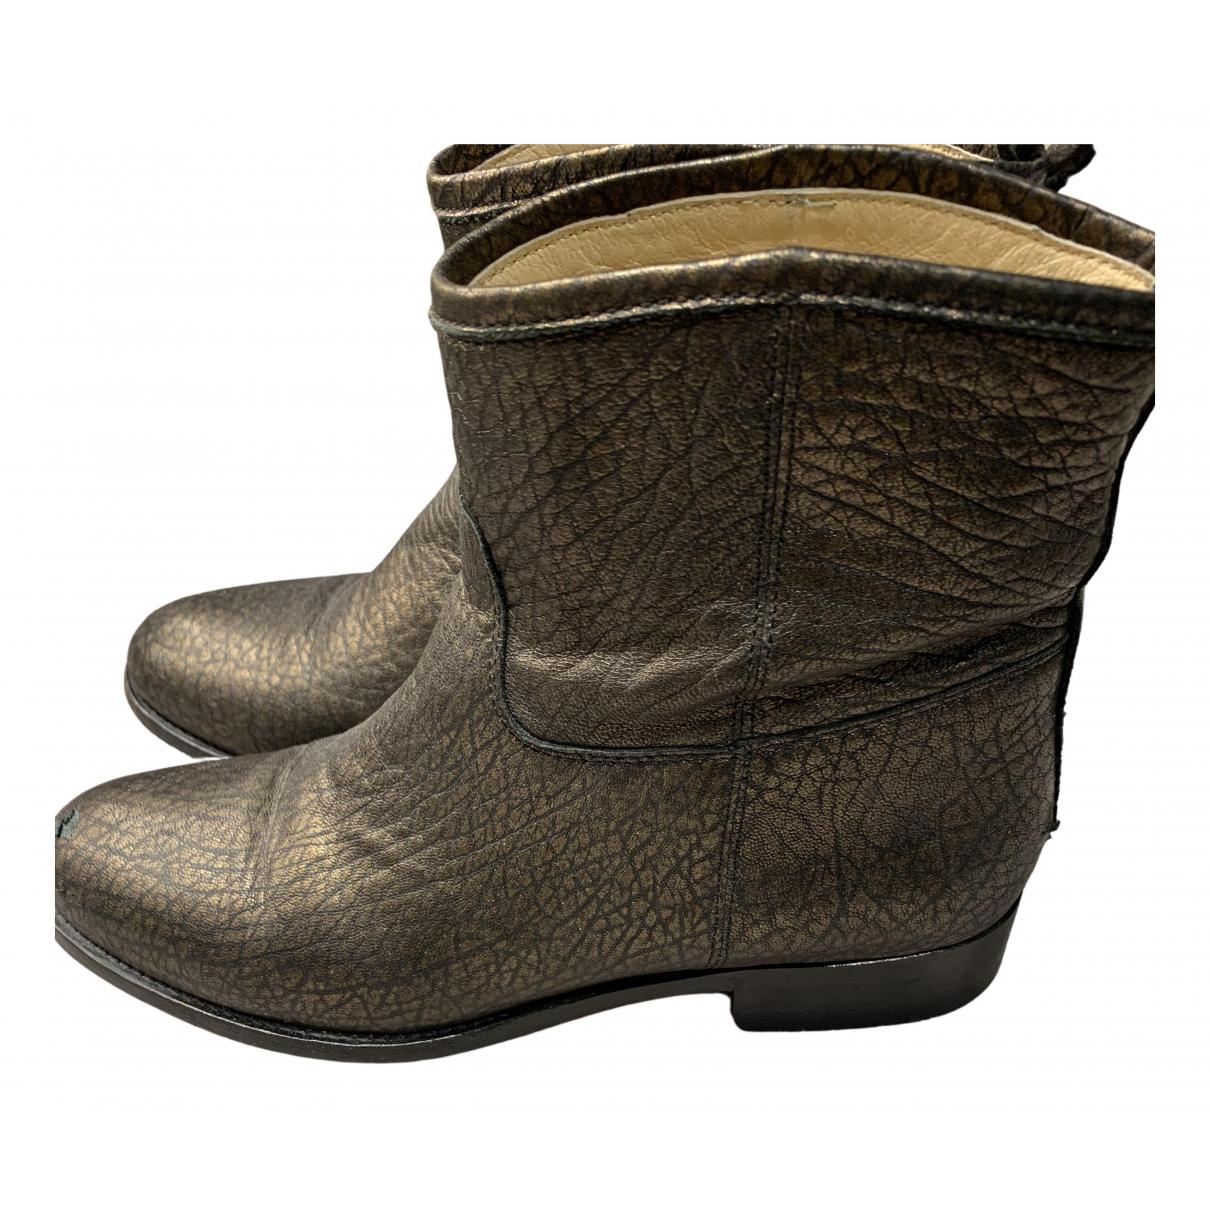 Jimmy Choo N Black Leather Boots for Women 38 EU